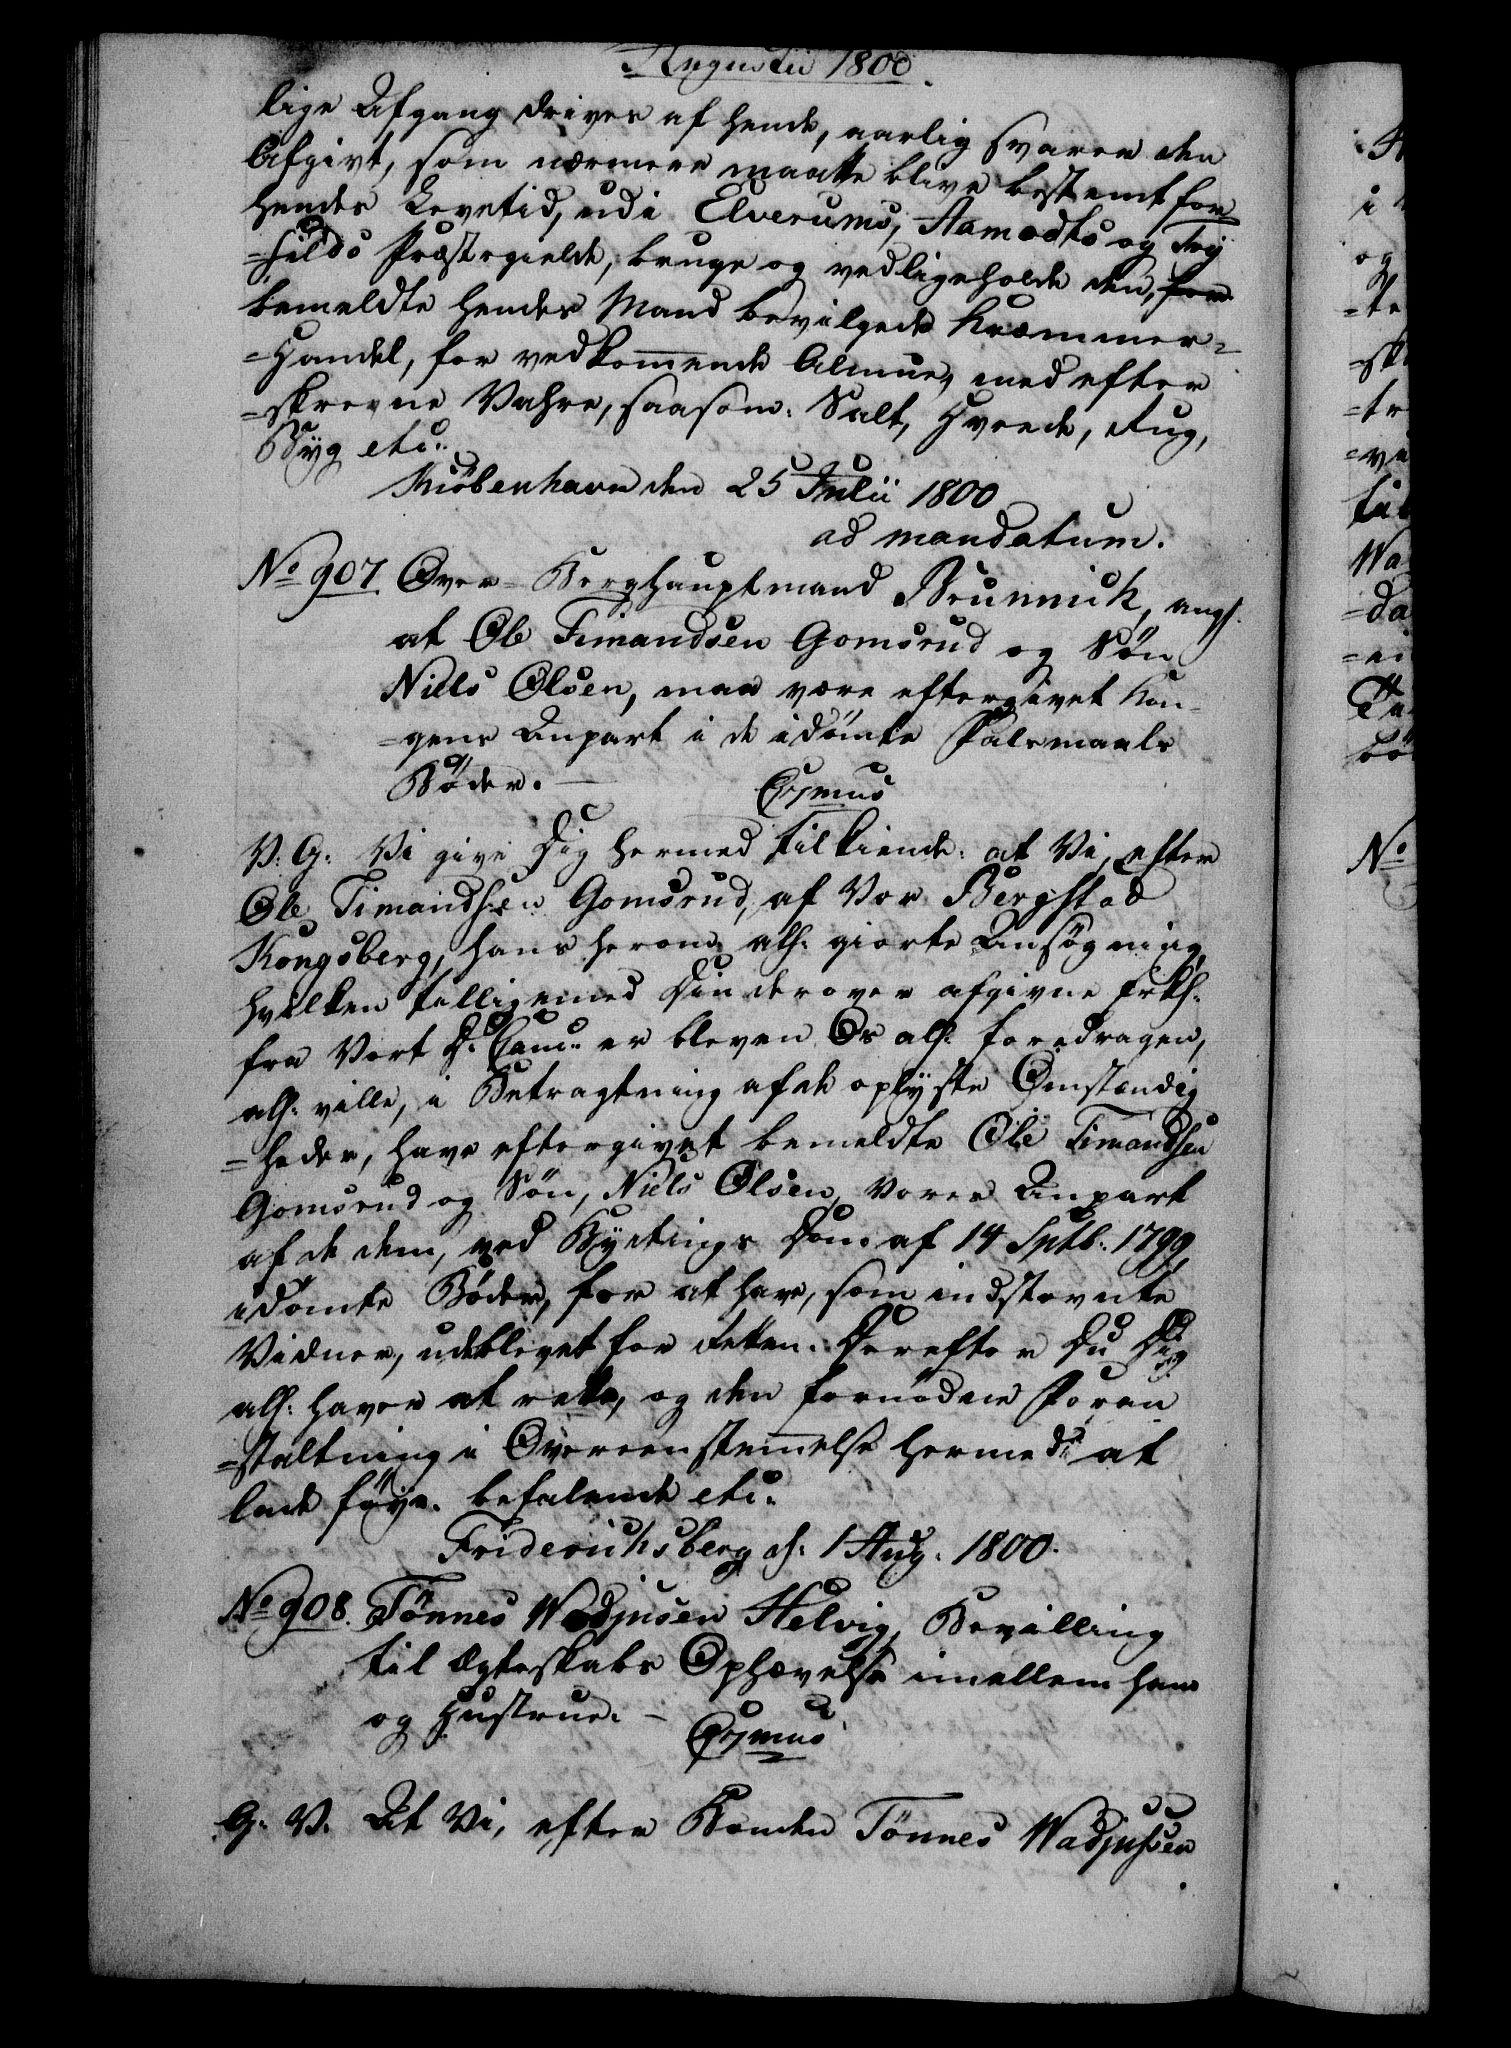 RA, Danske Kanselli 1800-1814, H/Hf/Hfb/Hfba/L0001: Registranter, 1800-1801, s. 290b